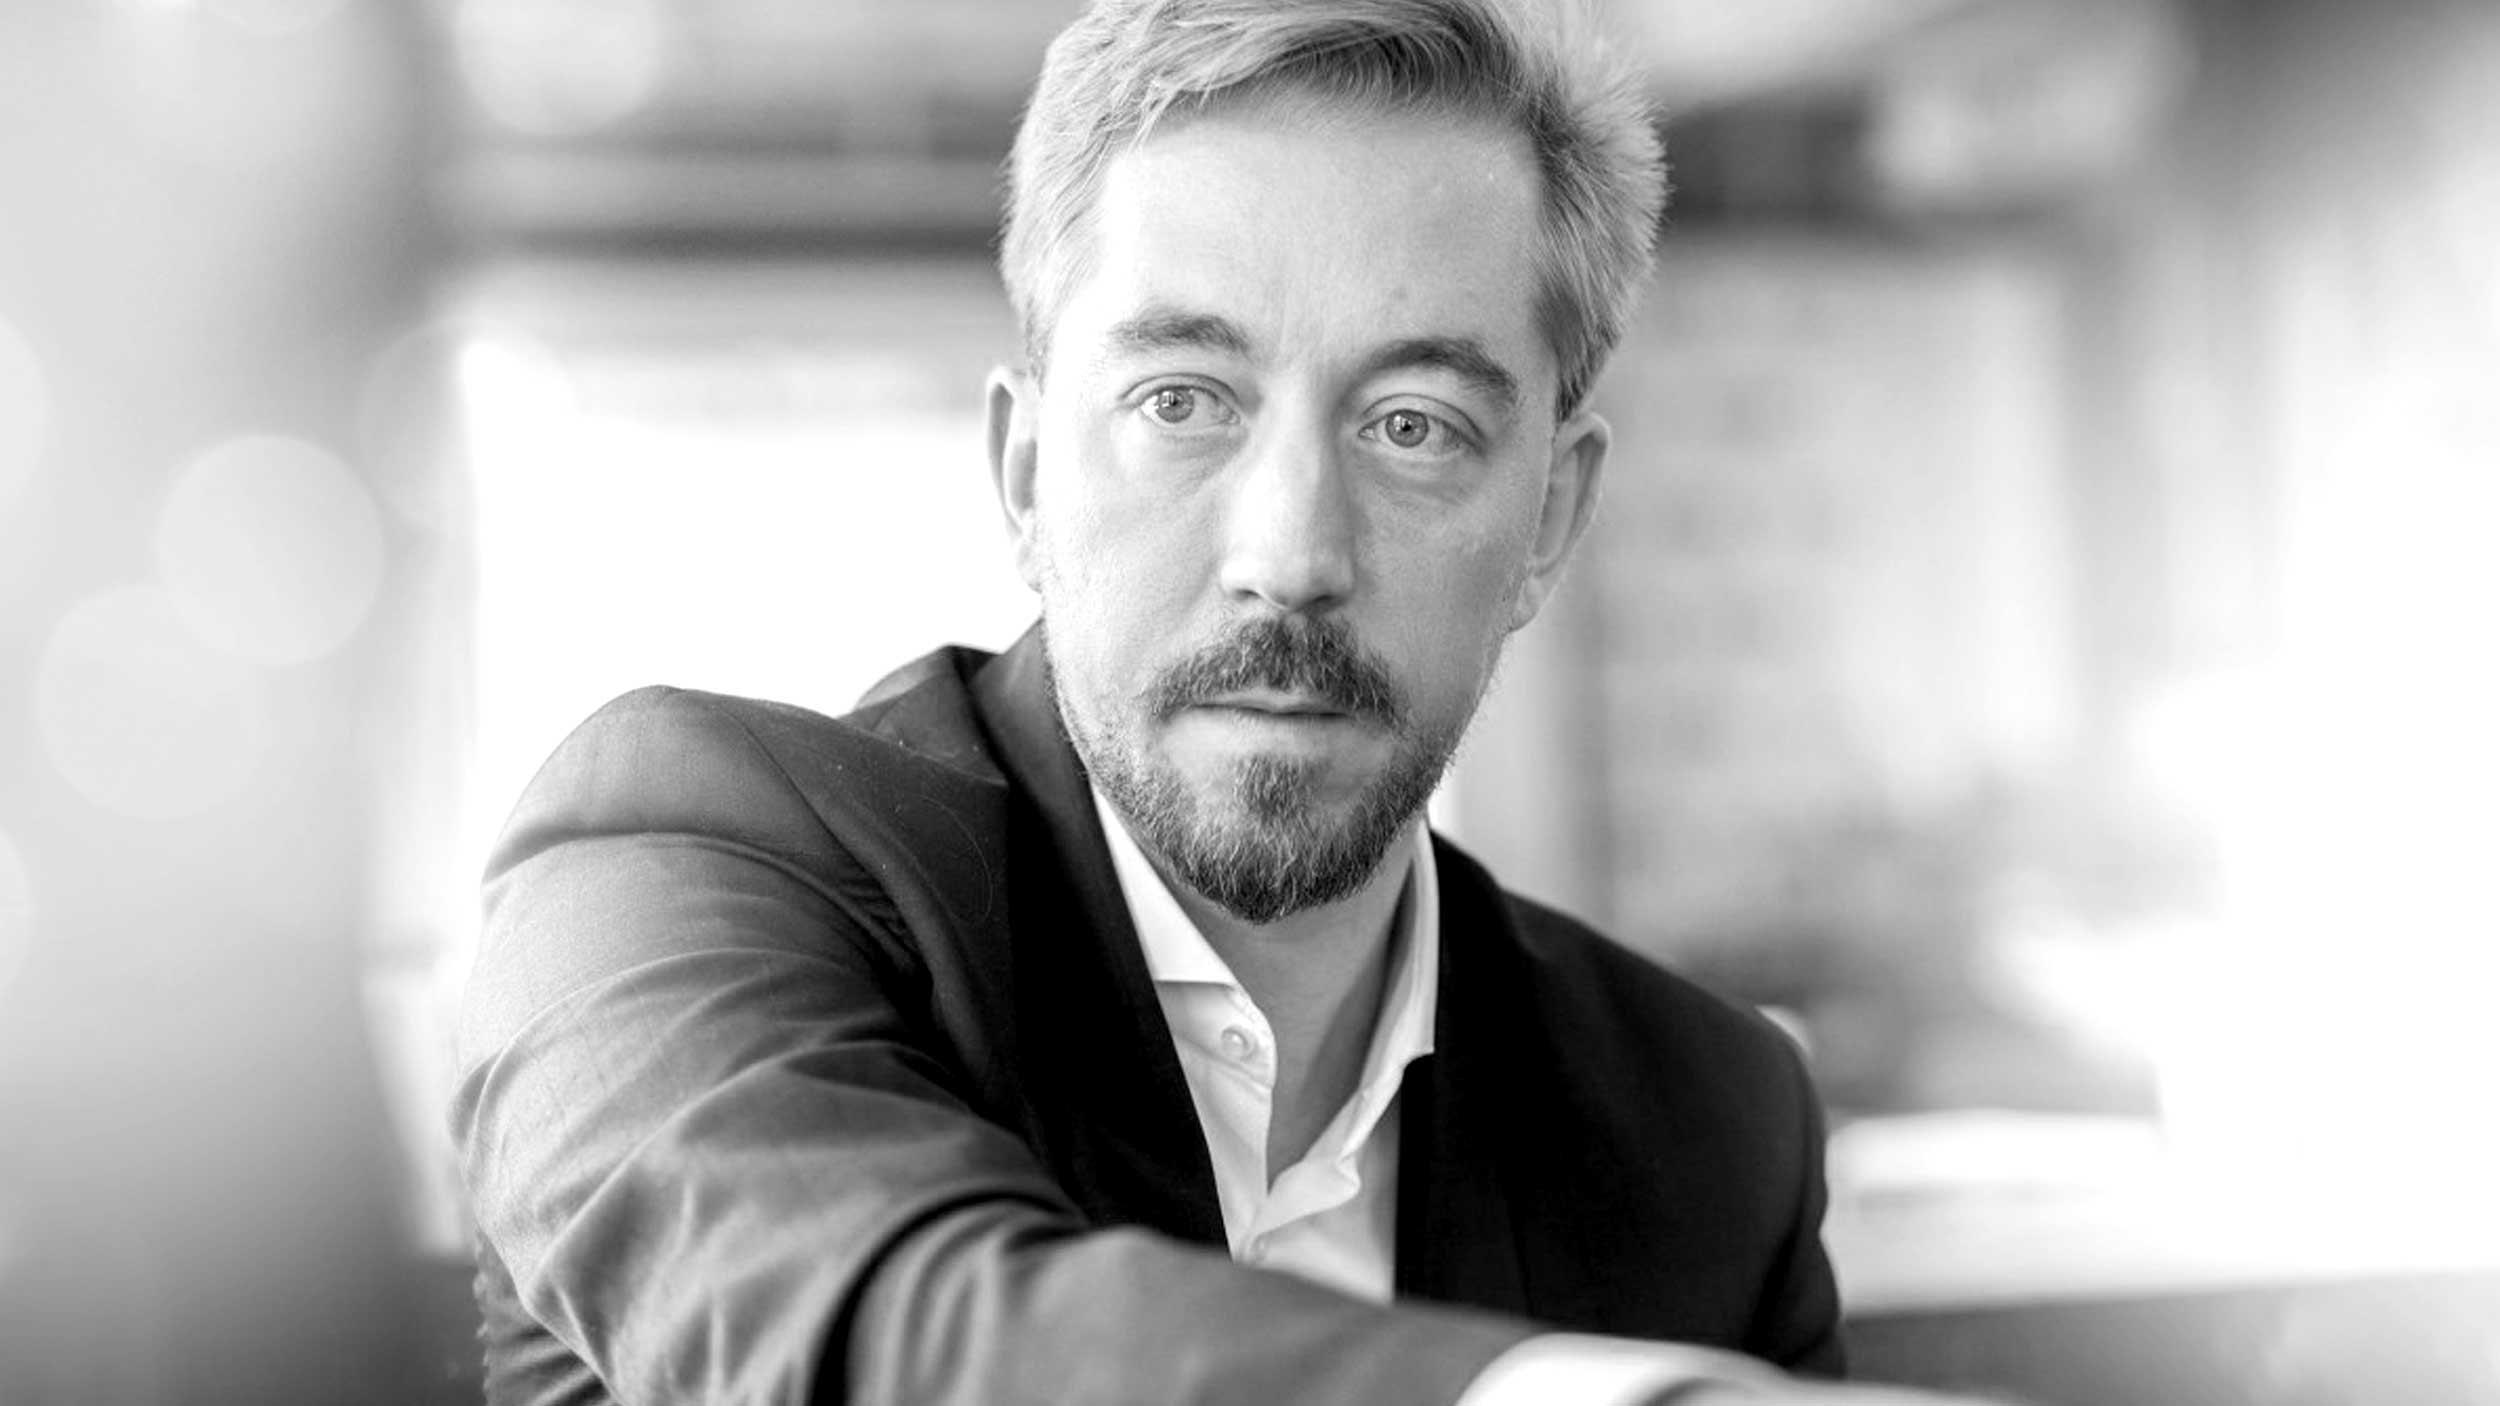 Jan Bathel